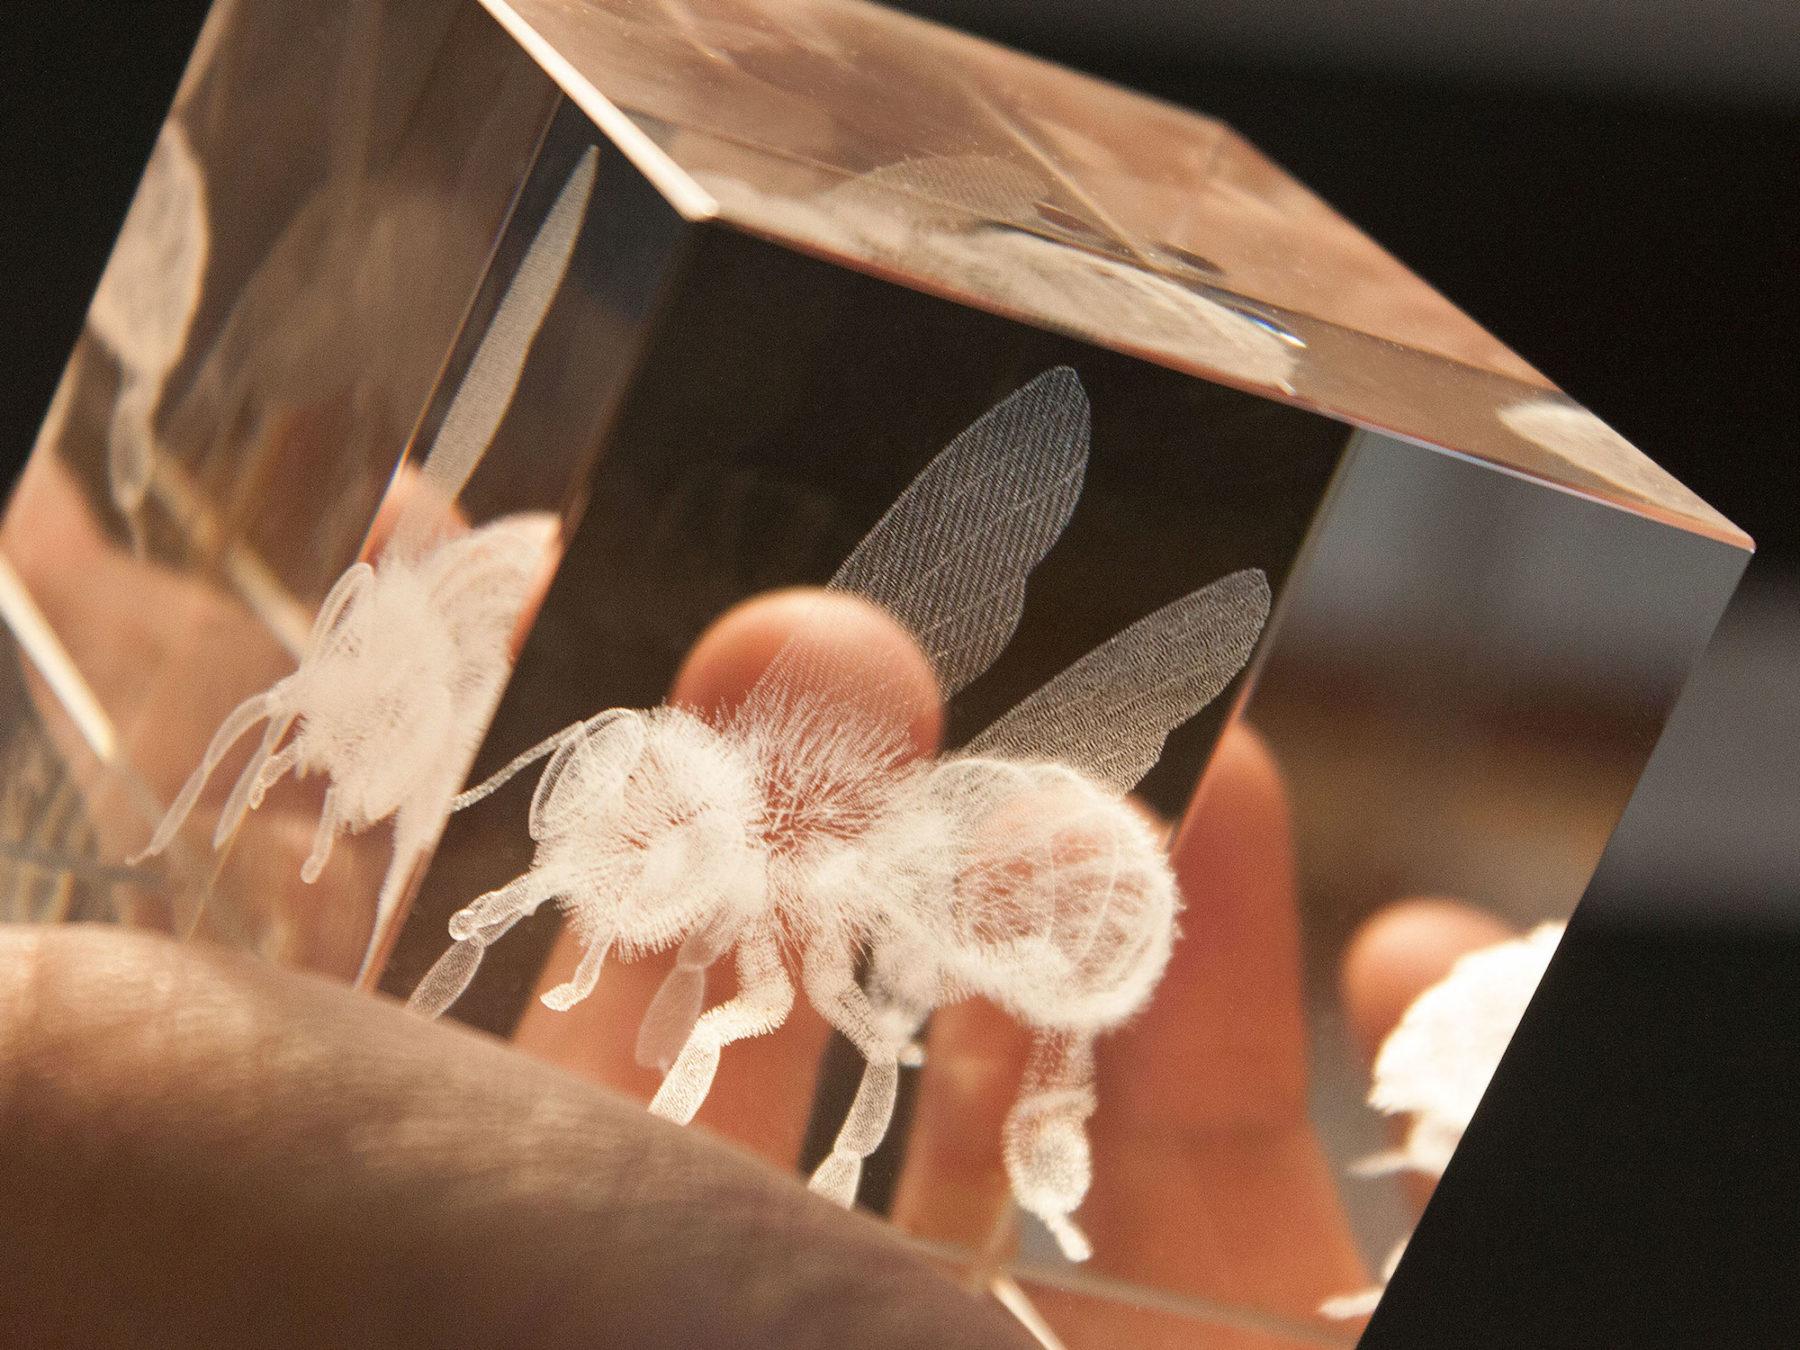 Biene im Glas 3D Glasquader Biene Glas Deko KURTS.ch